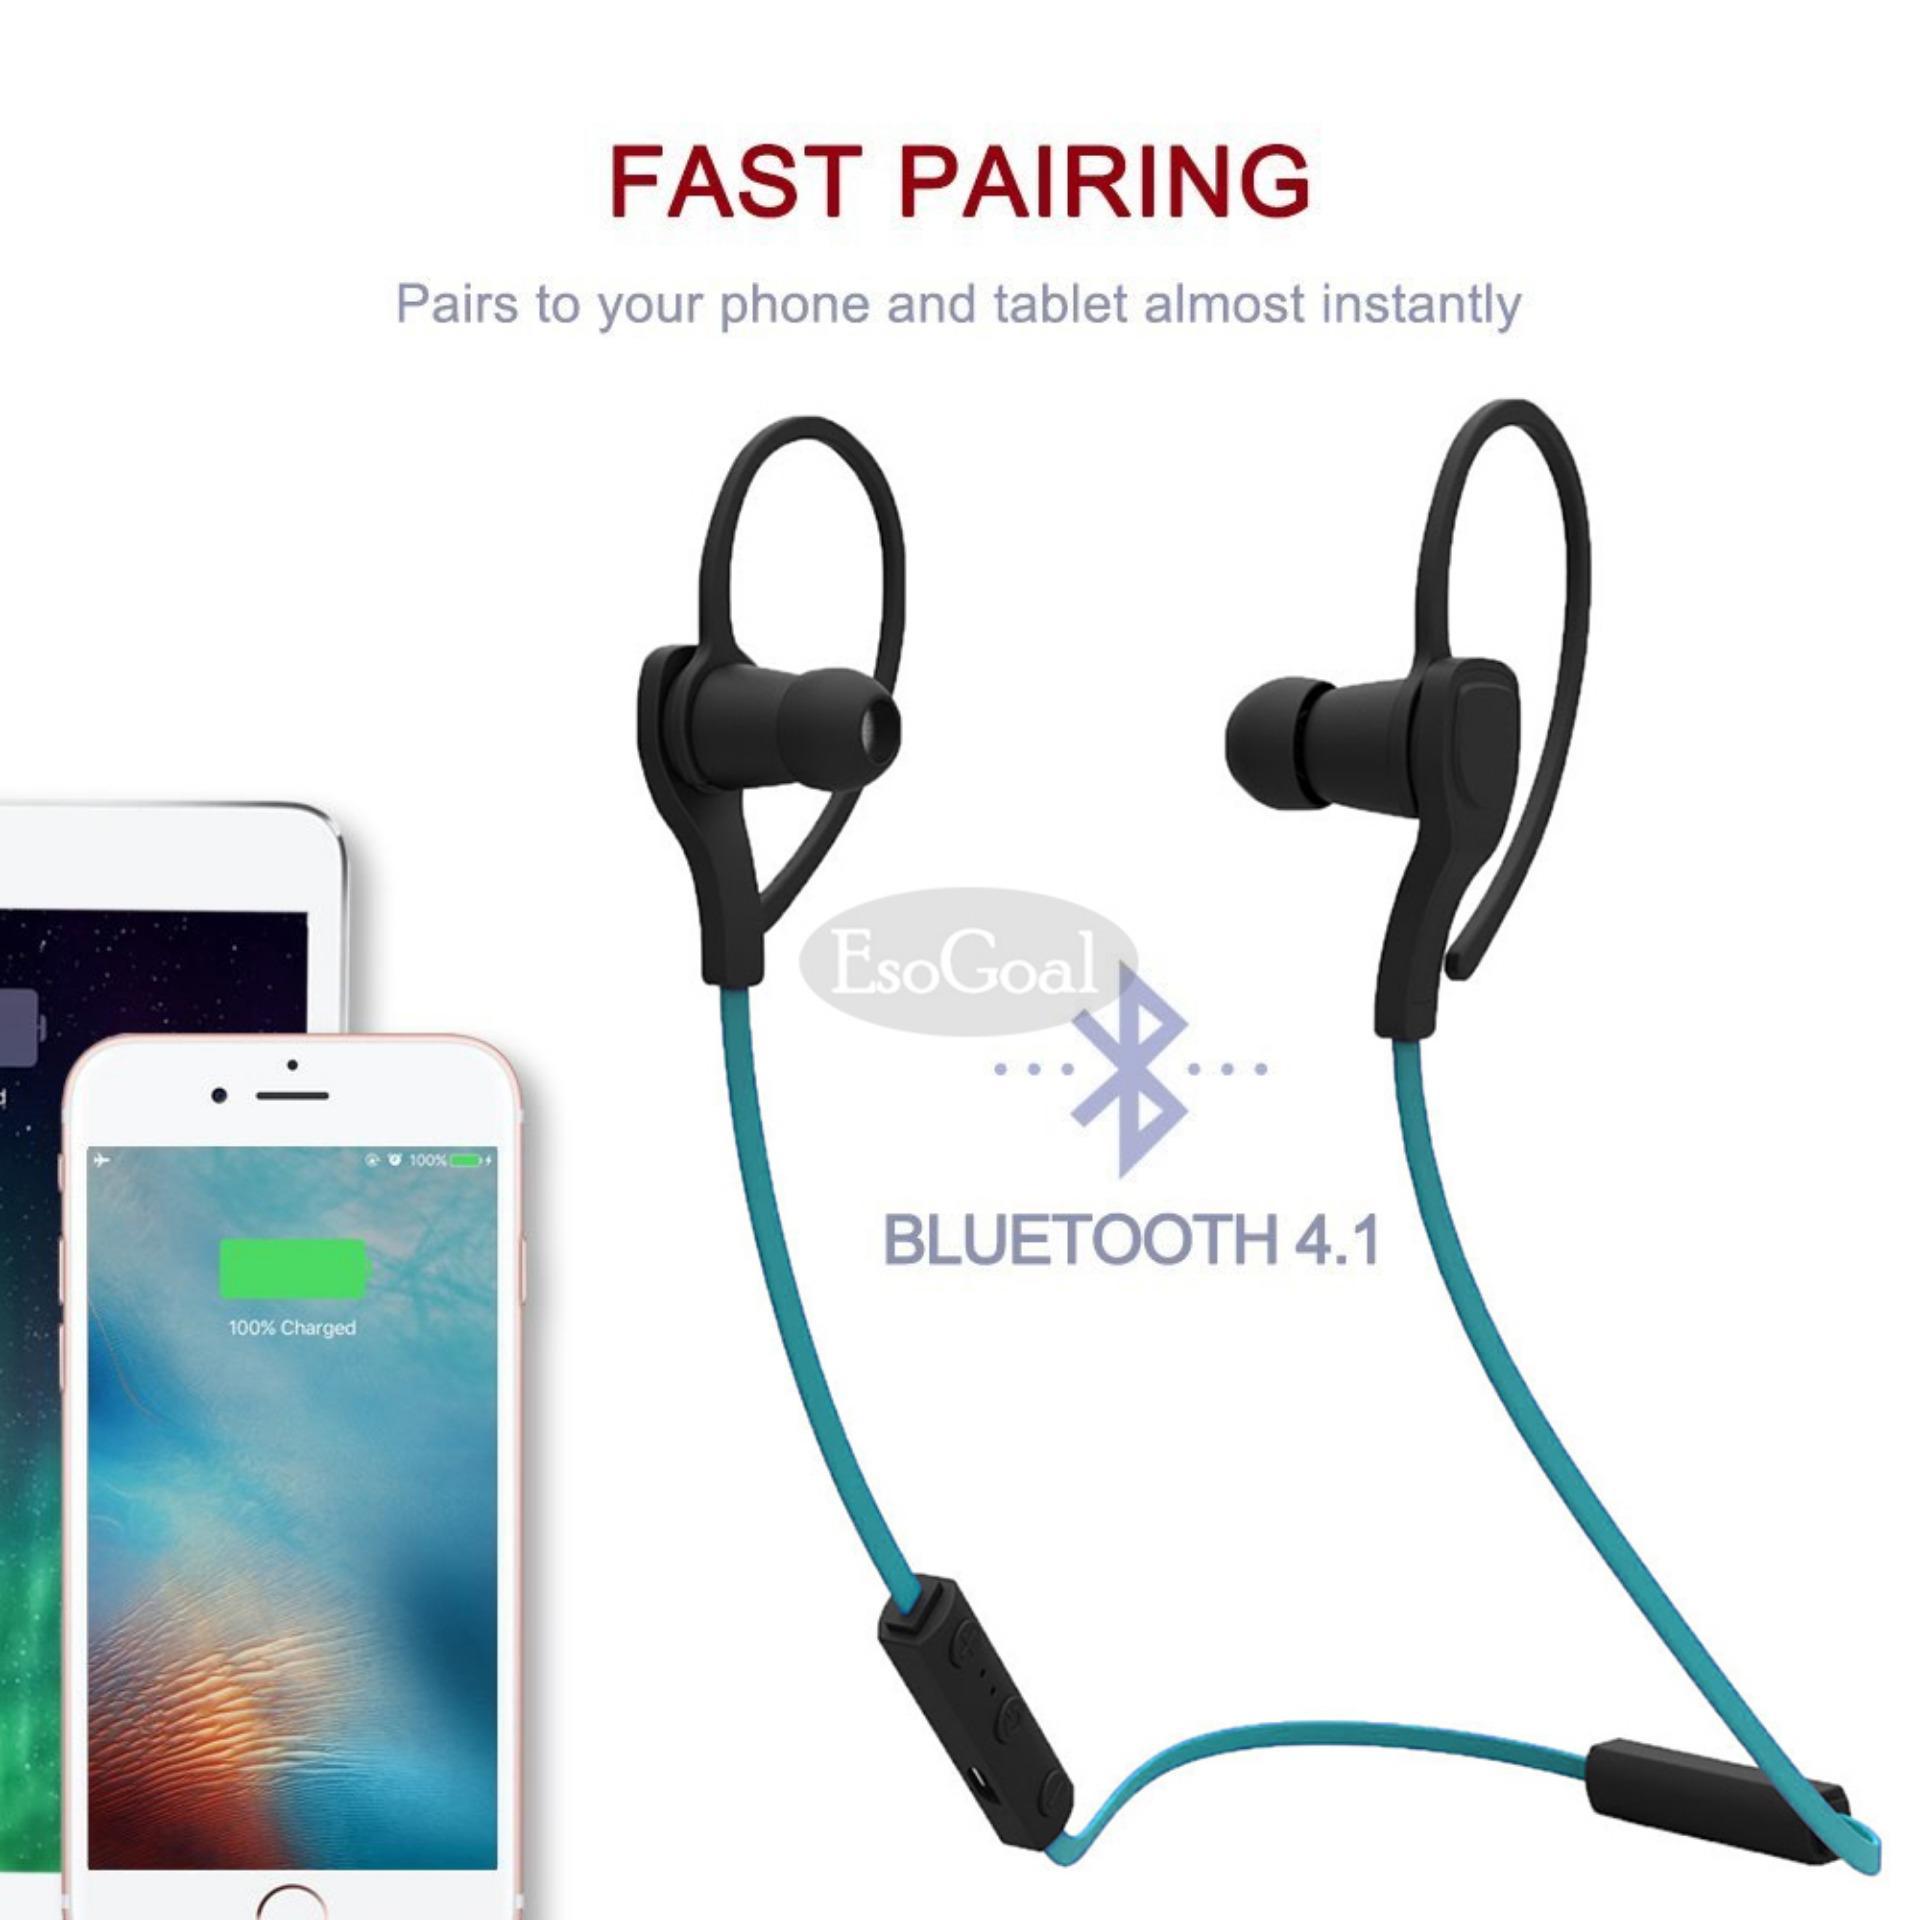 EsoGoal tujuan Bluetooth Wireless Headphone Olahraga Workout telinga tunas Gym headset menjalankan earphone